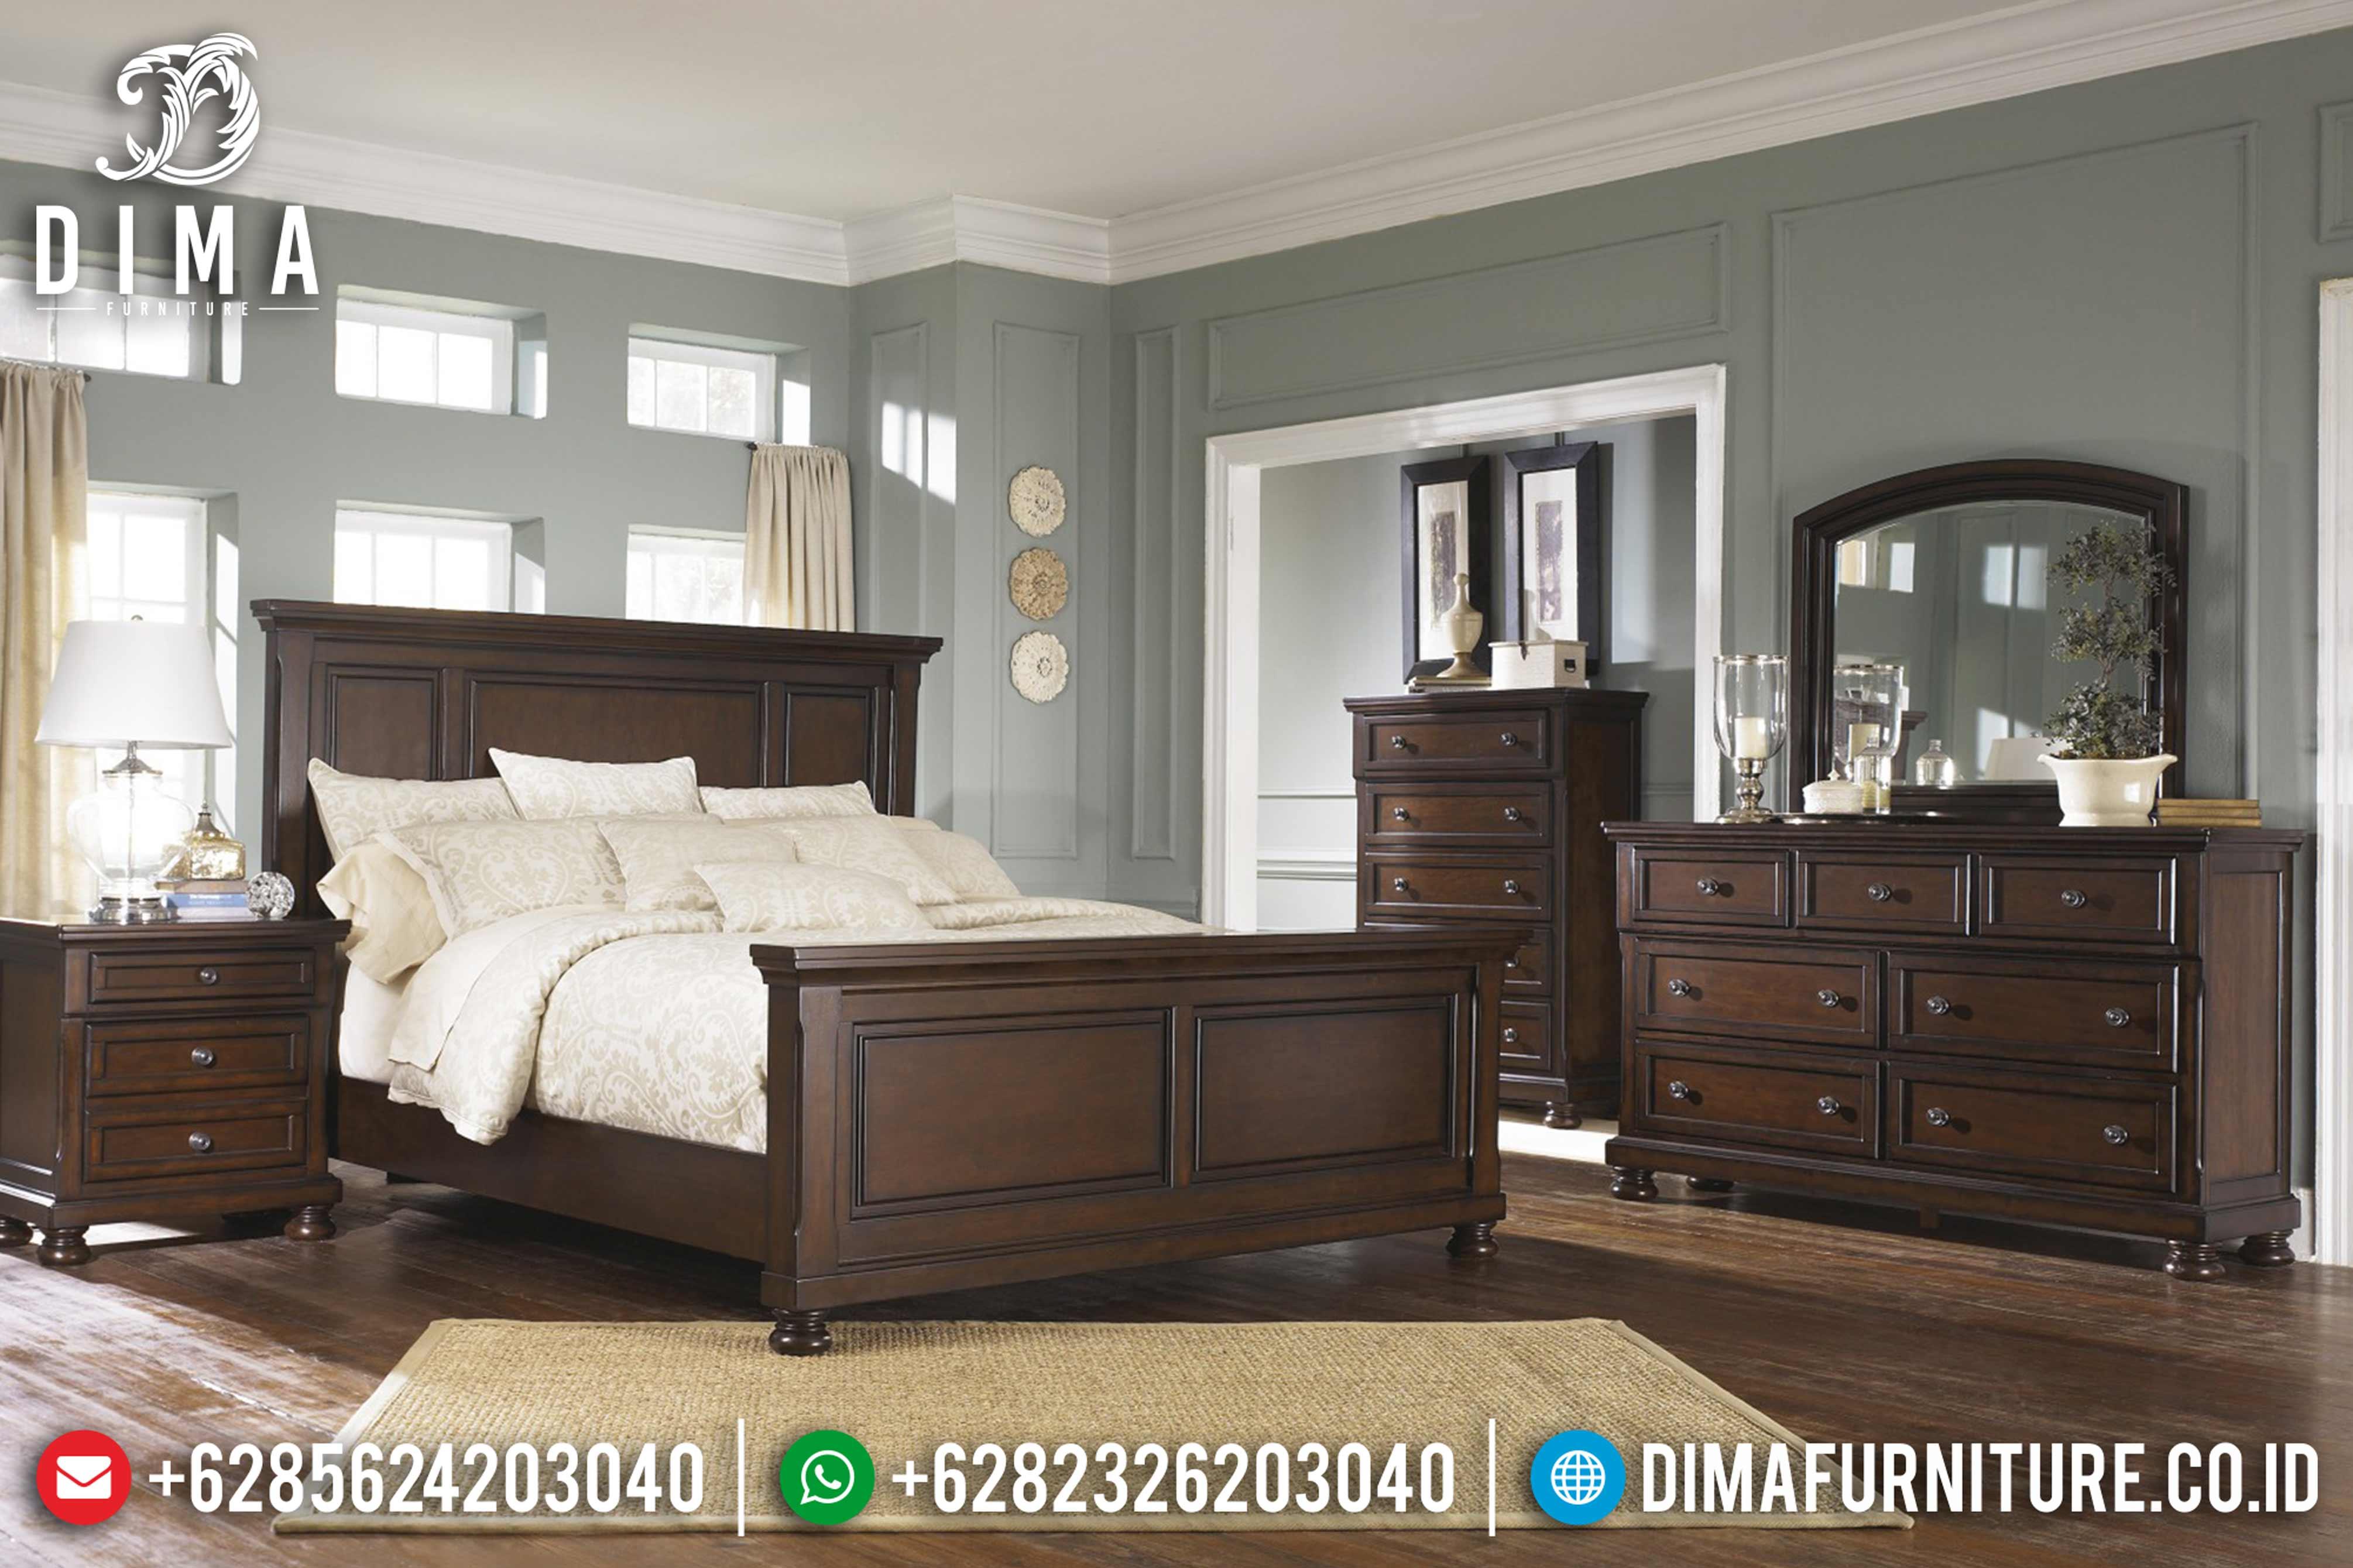 Jual Set Tempat Tidur Mewah Jepara Model Minimalis Terbaru Finishing Salak MMJ-0004